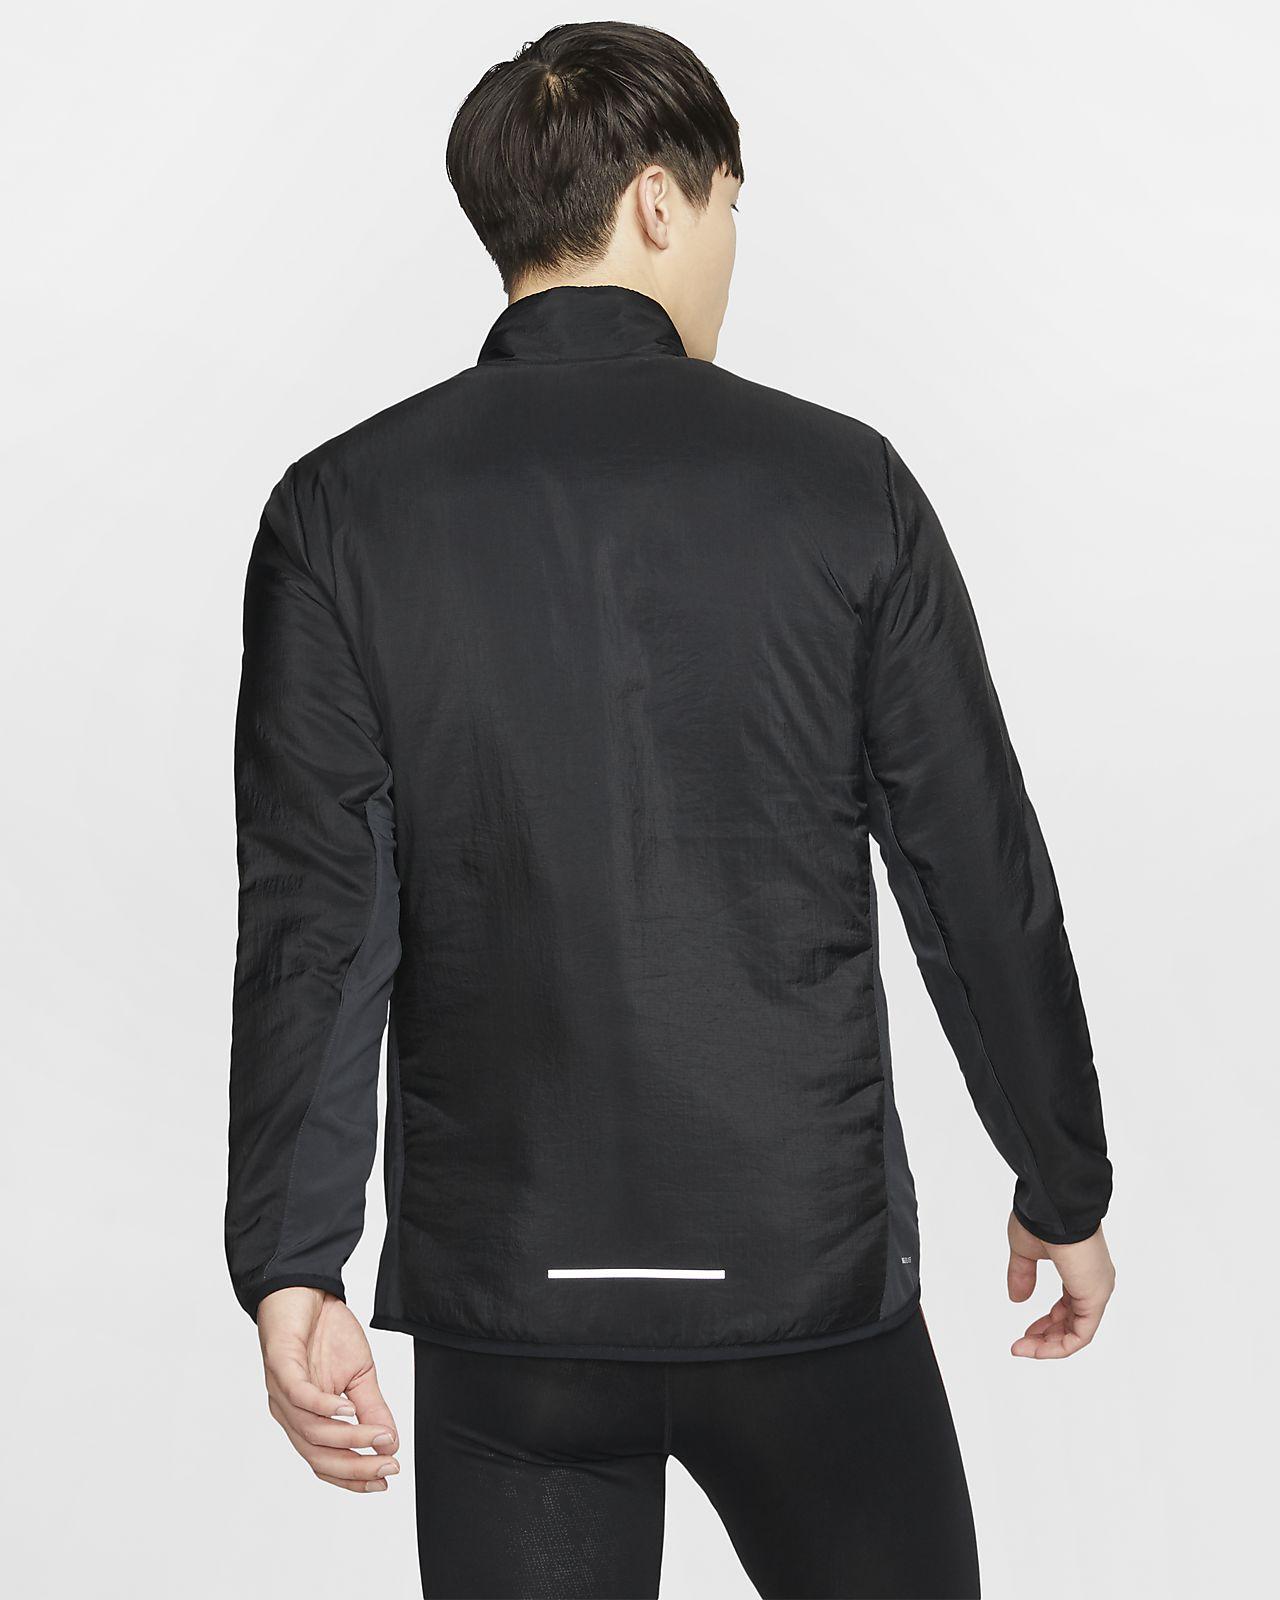 Casaco de running Nike AeroLayer para homem